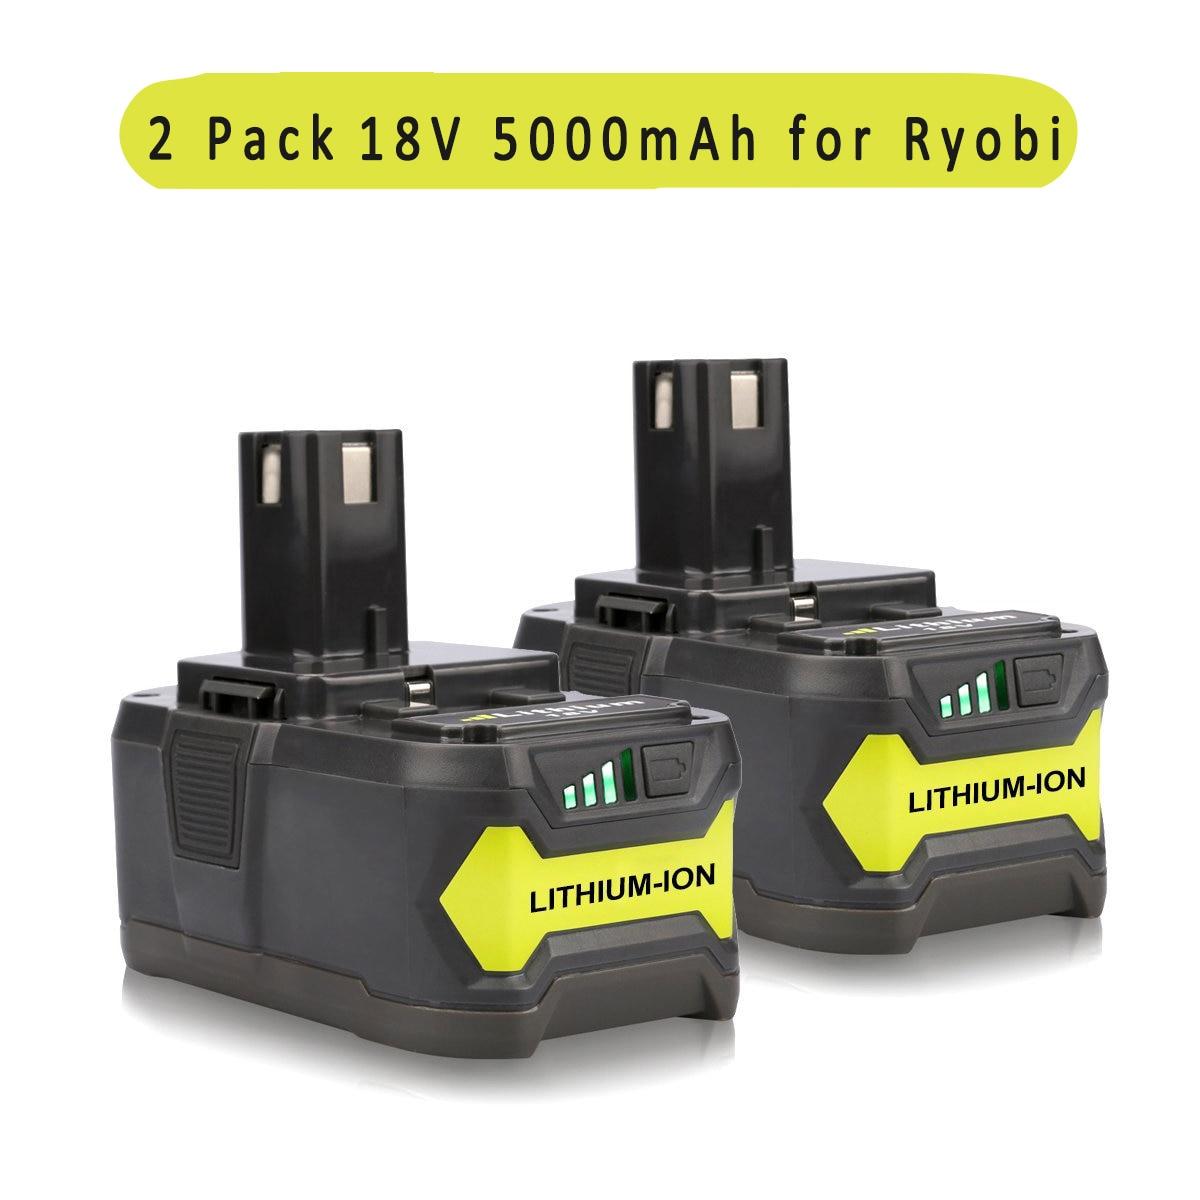 2PCS New Replacement 18V 5000mAH Lithium Power Tool Battery for Ryobi 18-Volt Tool P122 P102 P108 P109 набор bosch ножовка gsa 18v 32 0 601 6a8 102 адаптер gaa 18v 24